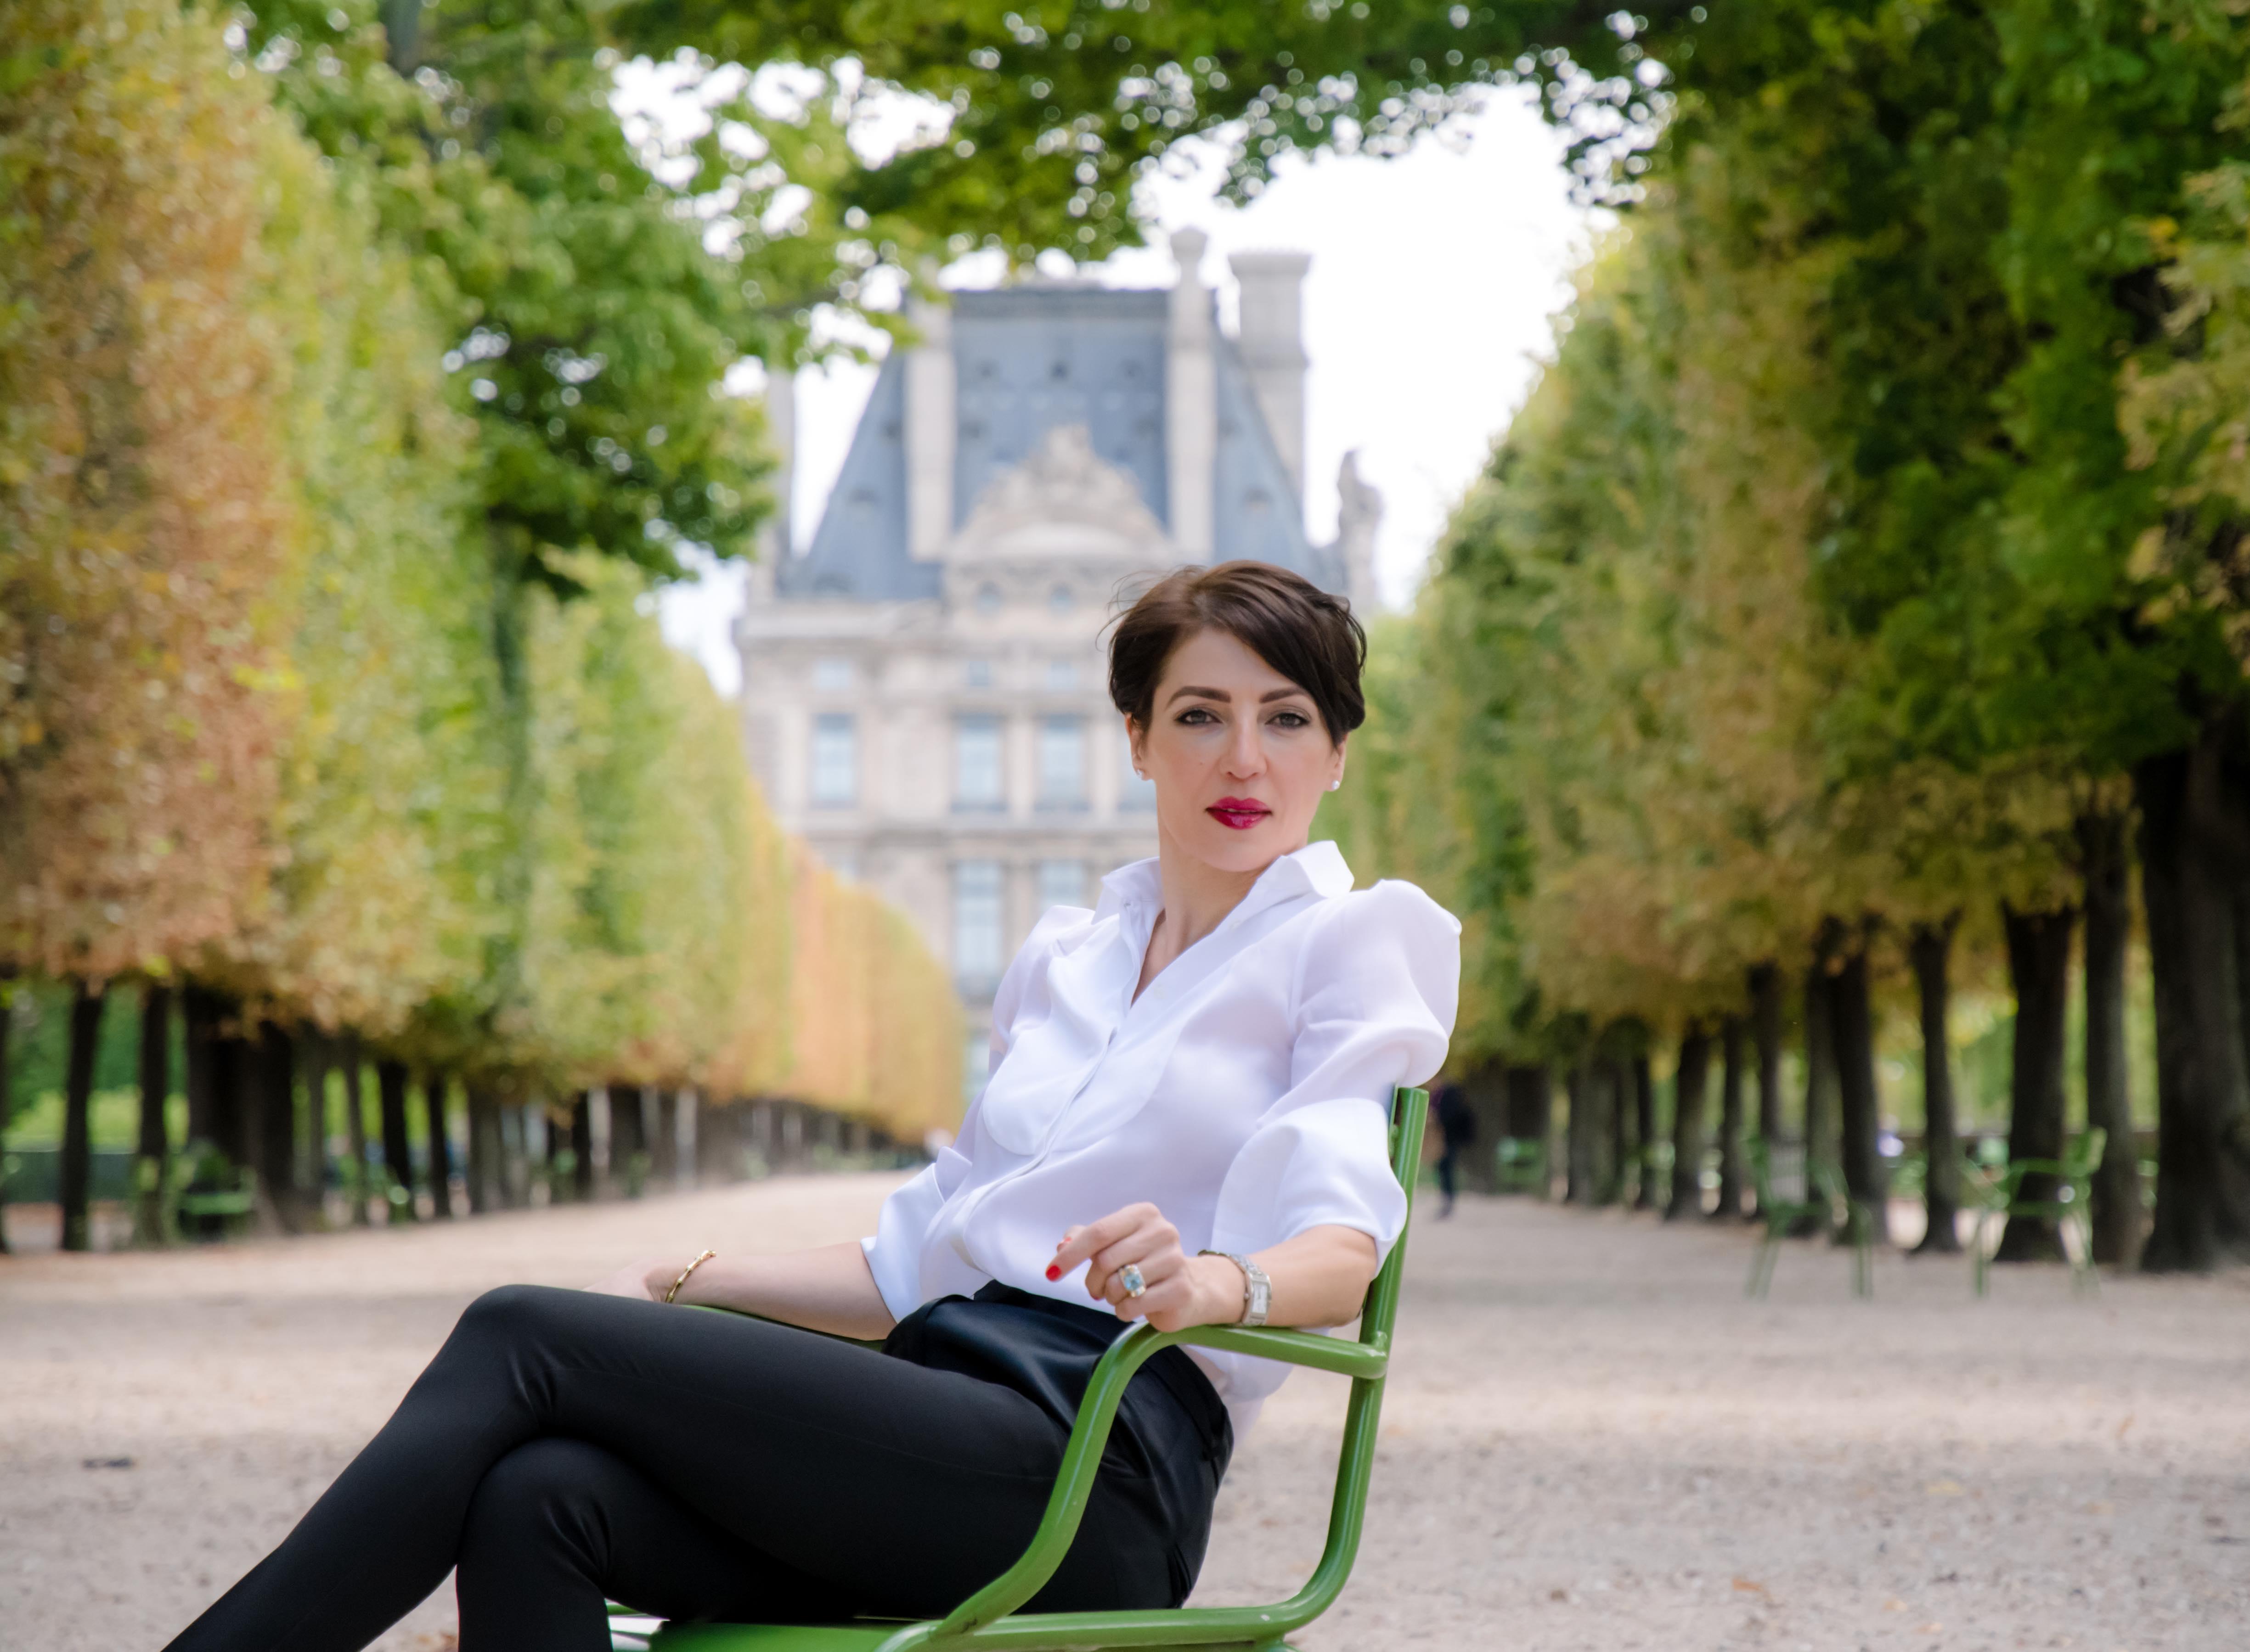 La Fervance founder Melissa Obeid